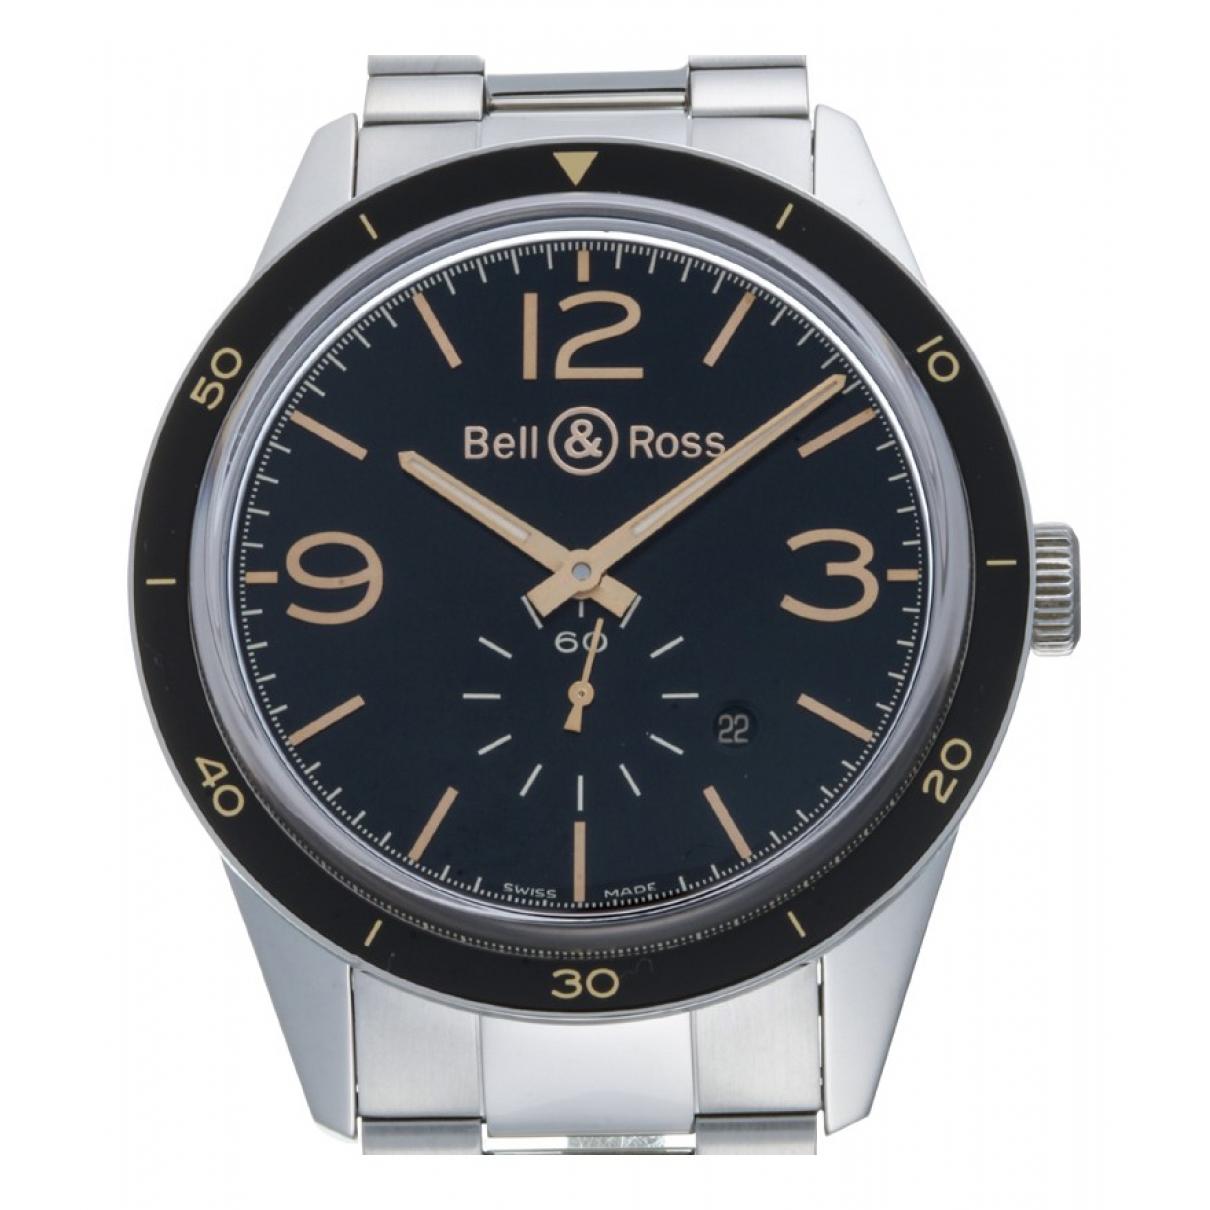 Relojes BR123 Bell & Ross